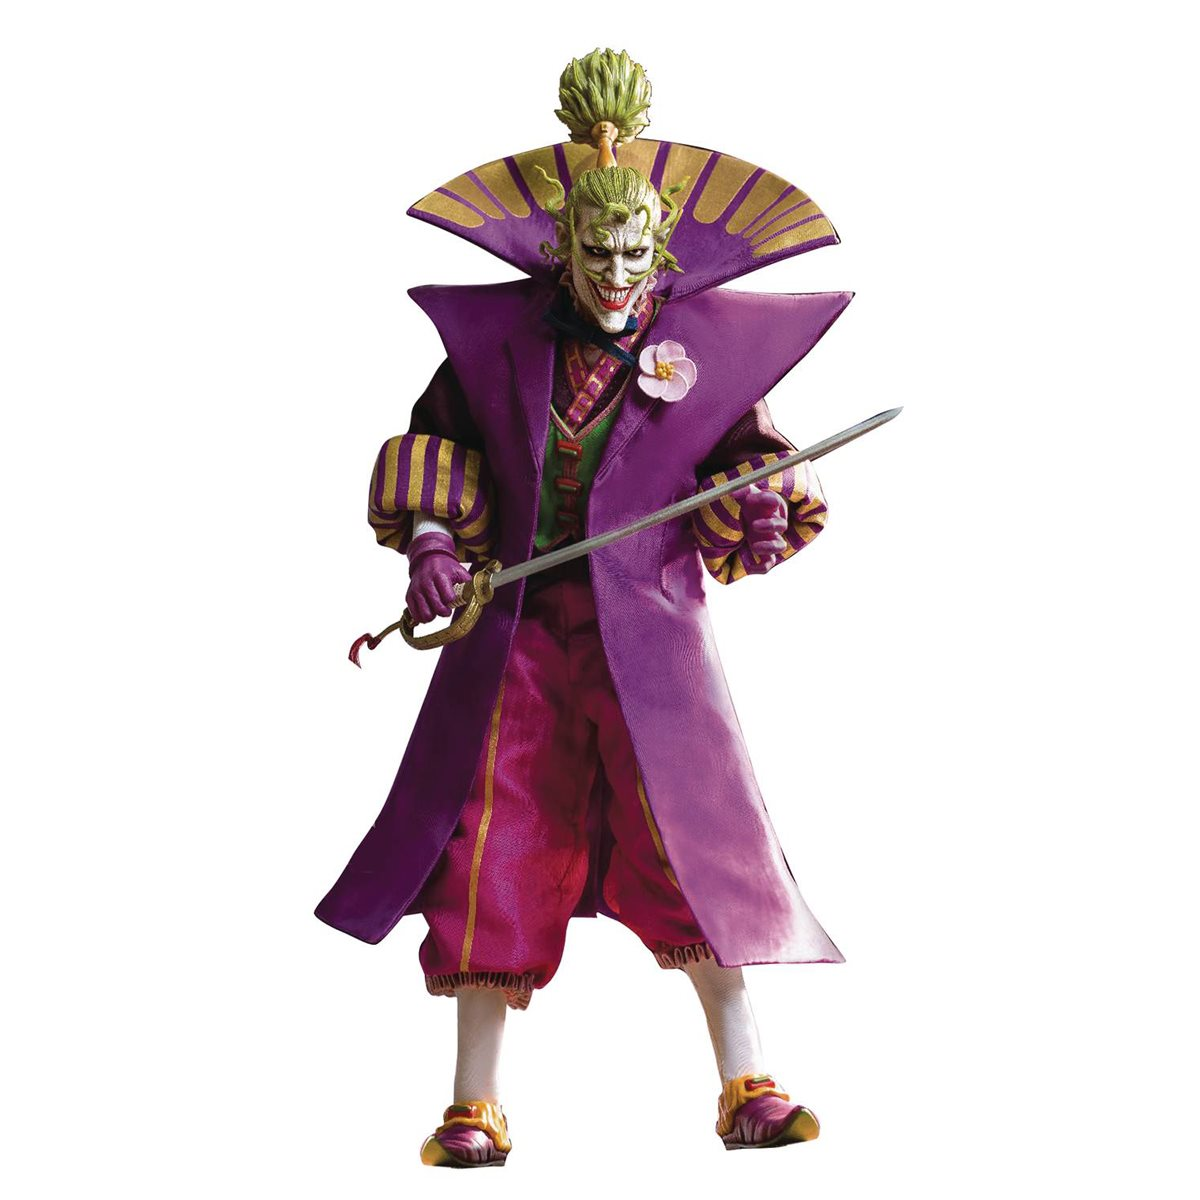 Batman Ninja Joker 1 6 Scale Action Figure